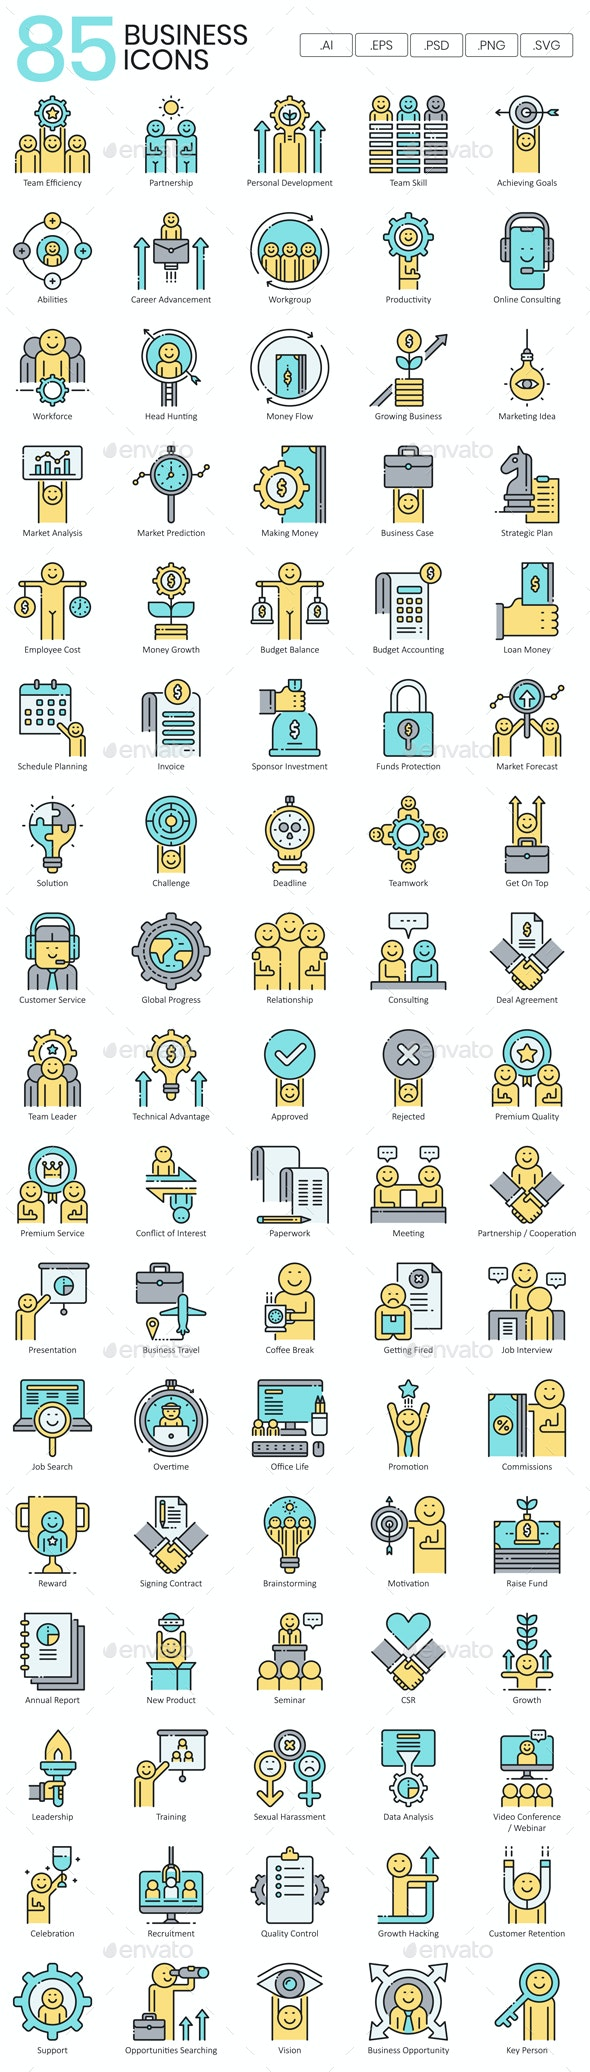 Business Icons | Aqua - Business Icons